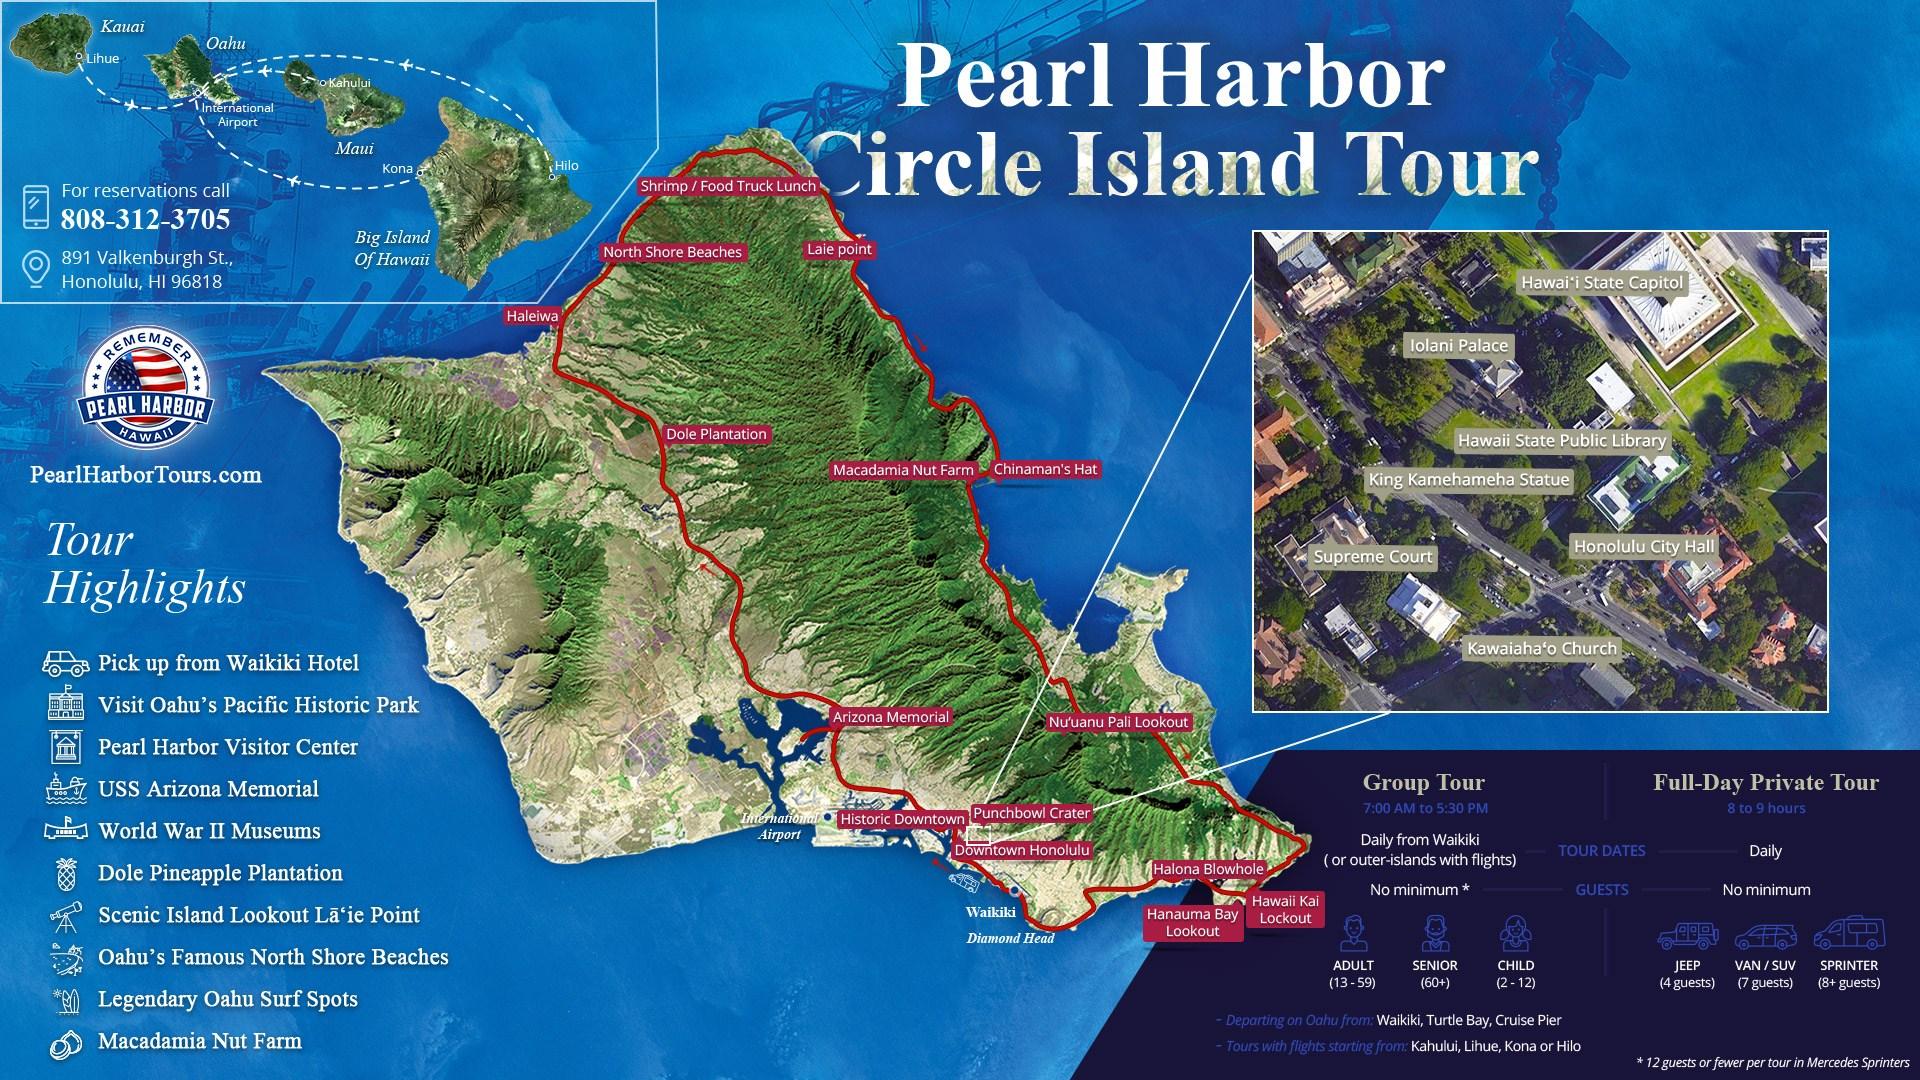 Oahu Circle Island Pearl Harbor Tour Map